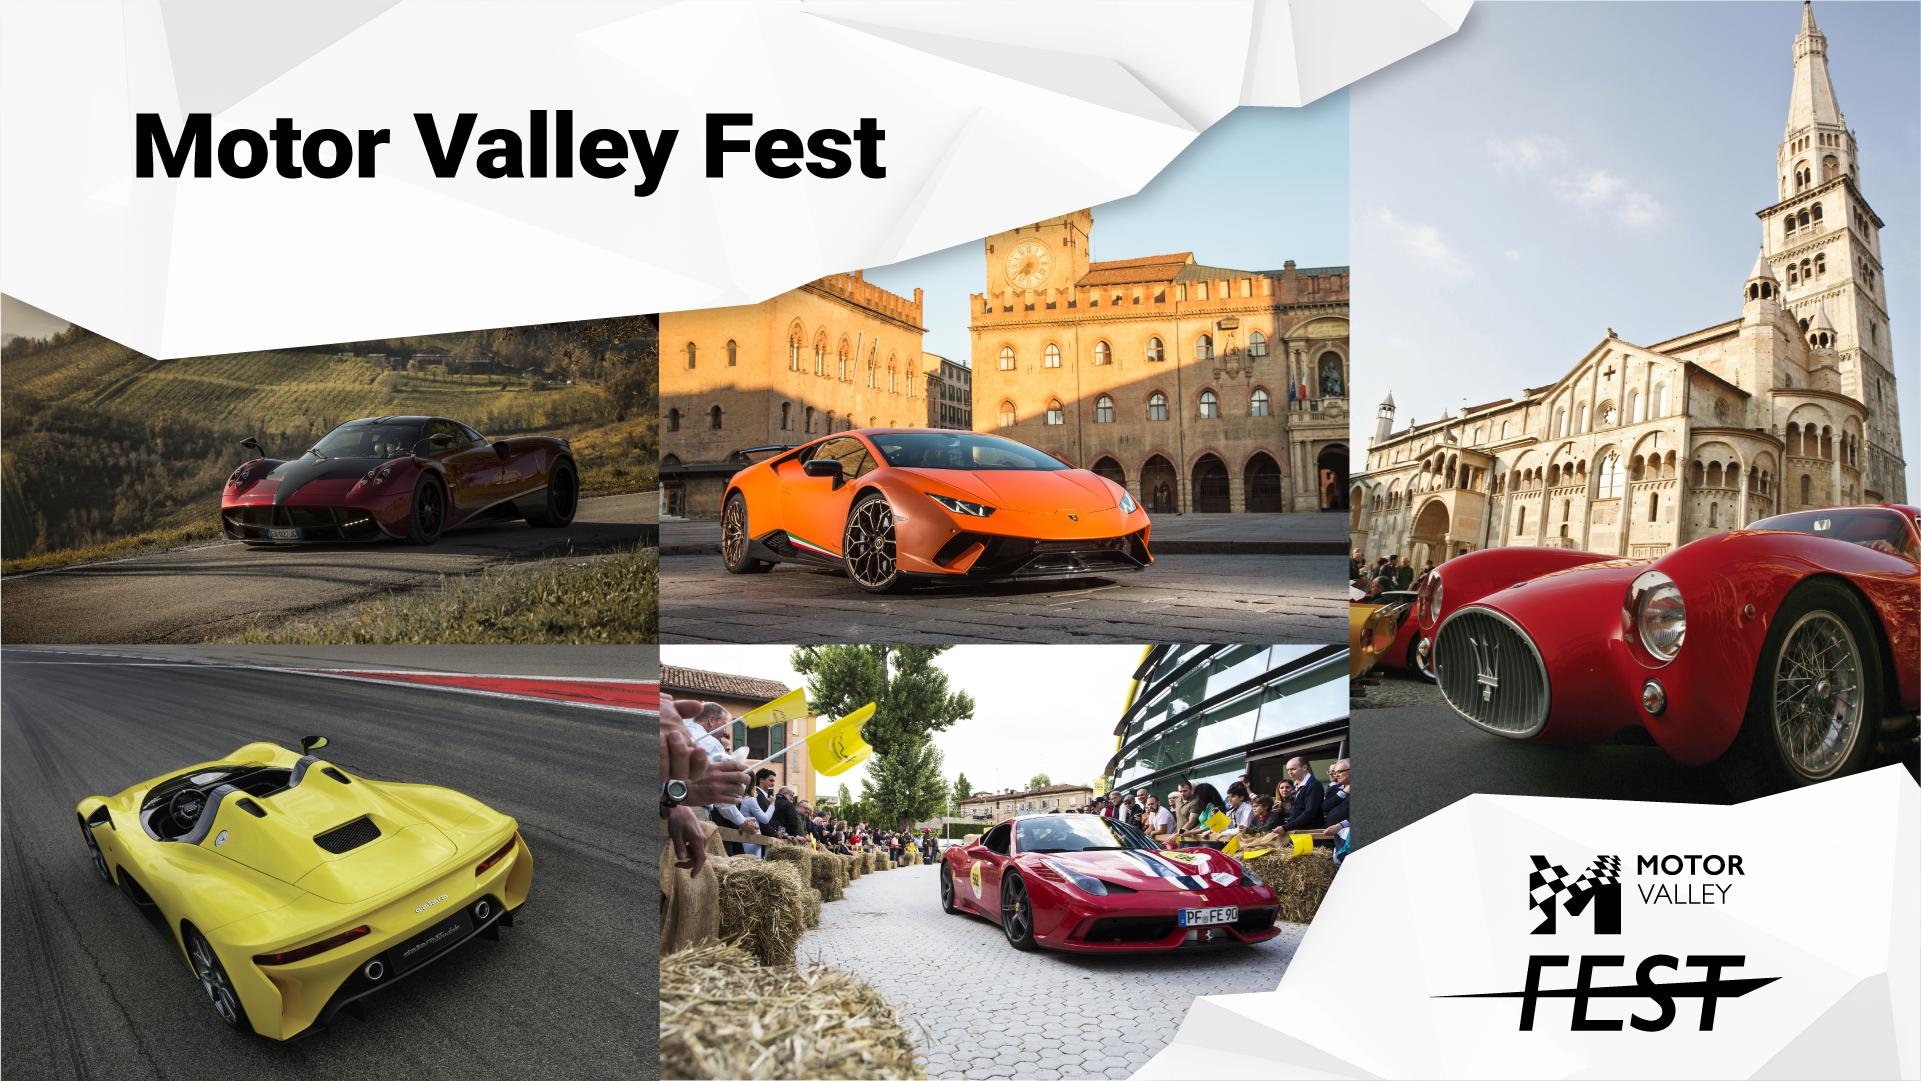 Motor Valley Fest 2019